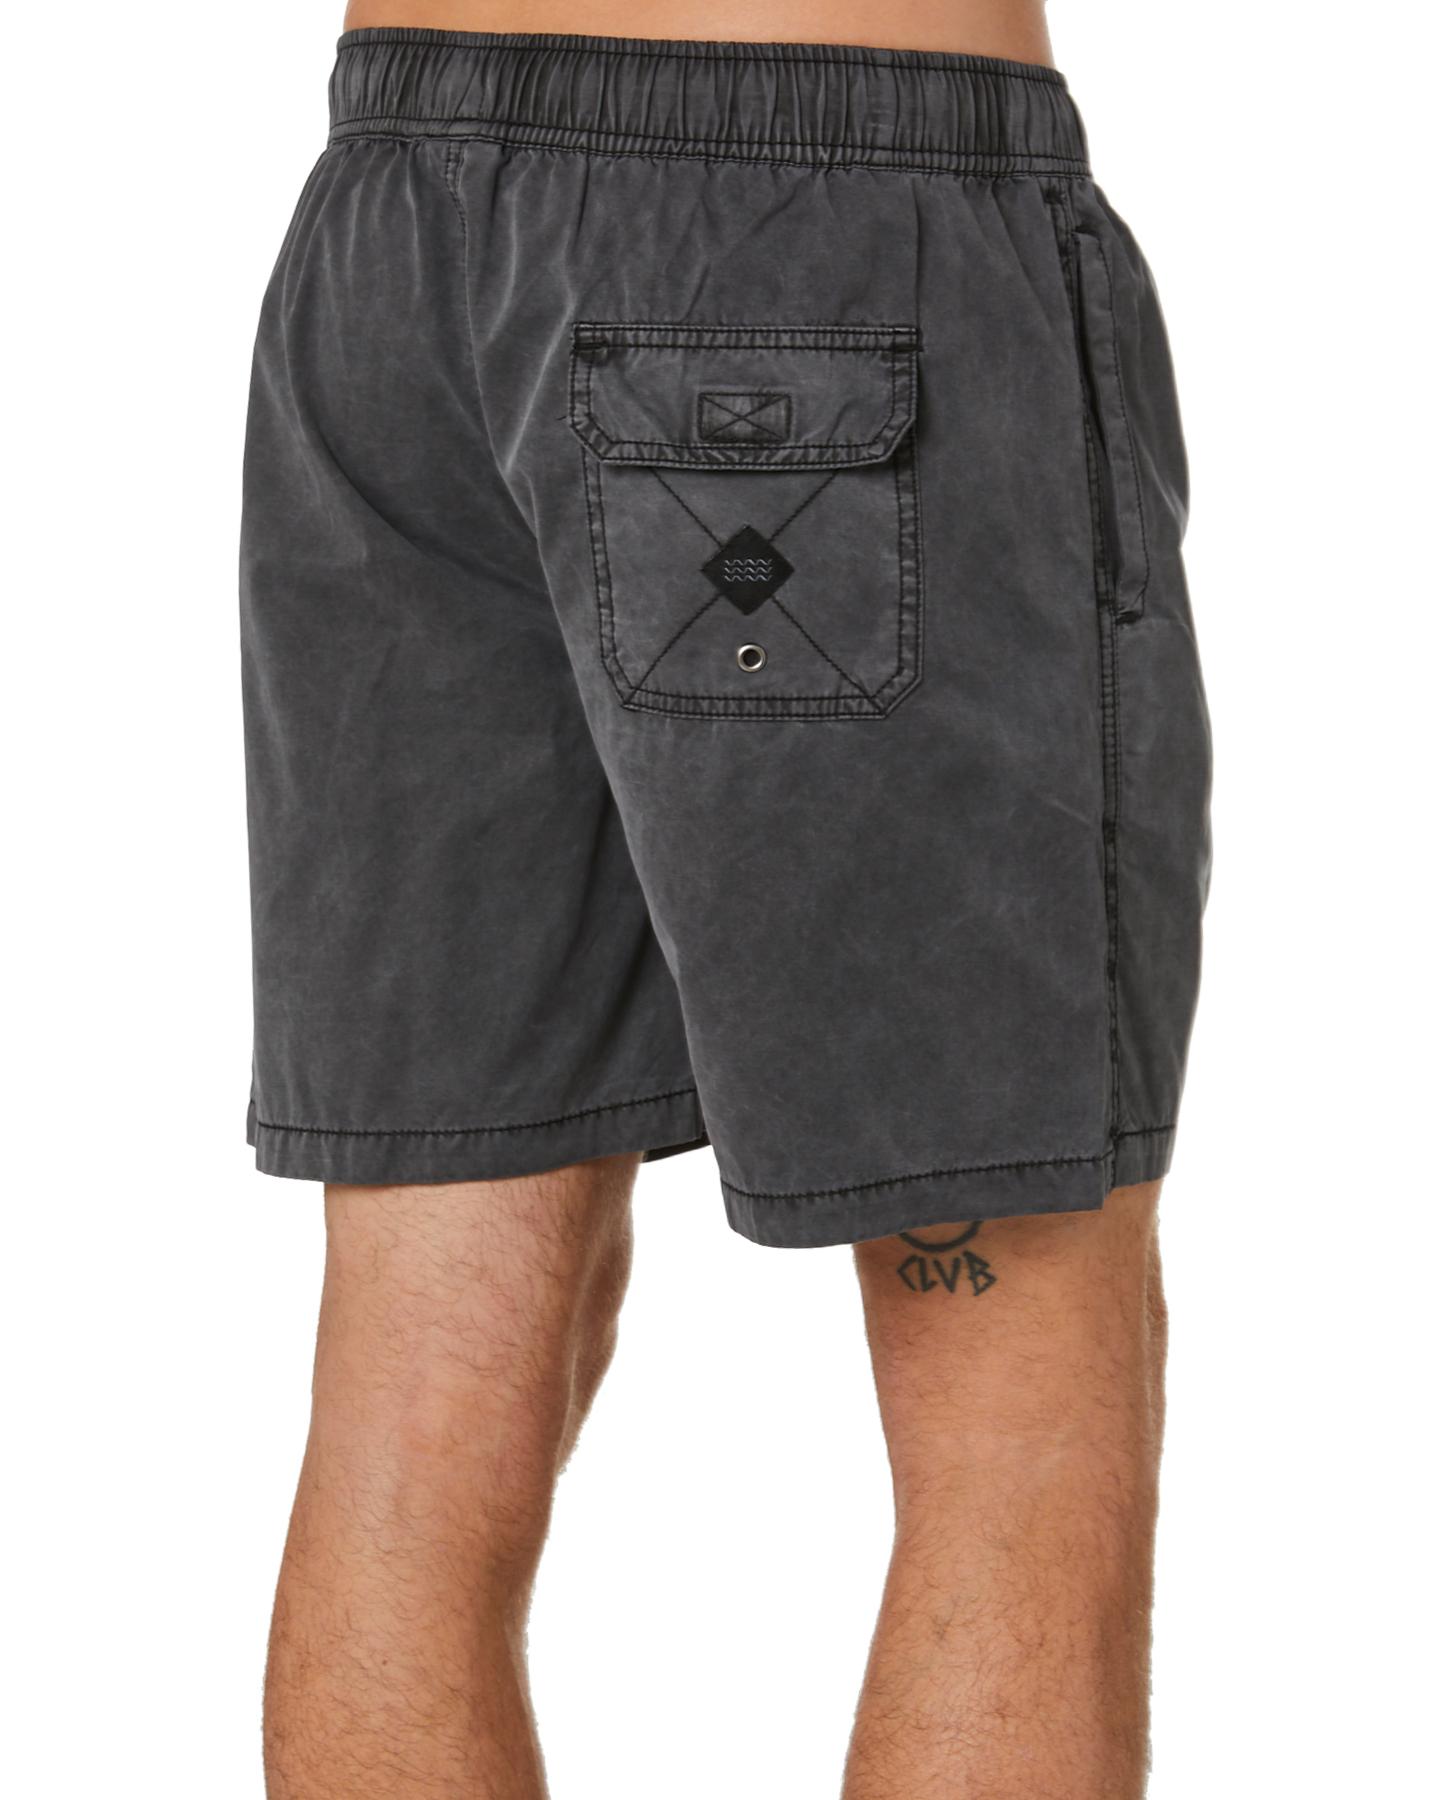 New-Swell-Men-039-s-Malibu-Mens-Beach-Short-Cotton-Polyester-Grey thumbnail 10